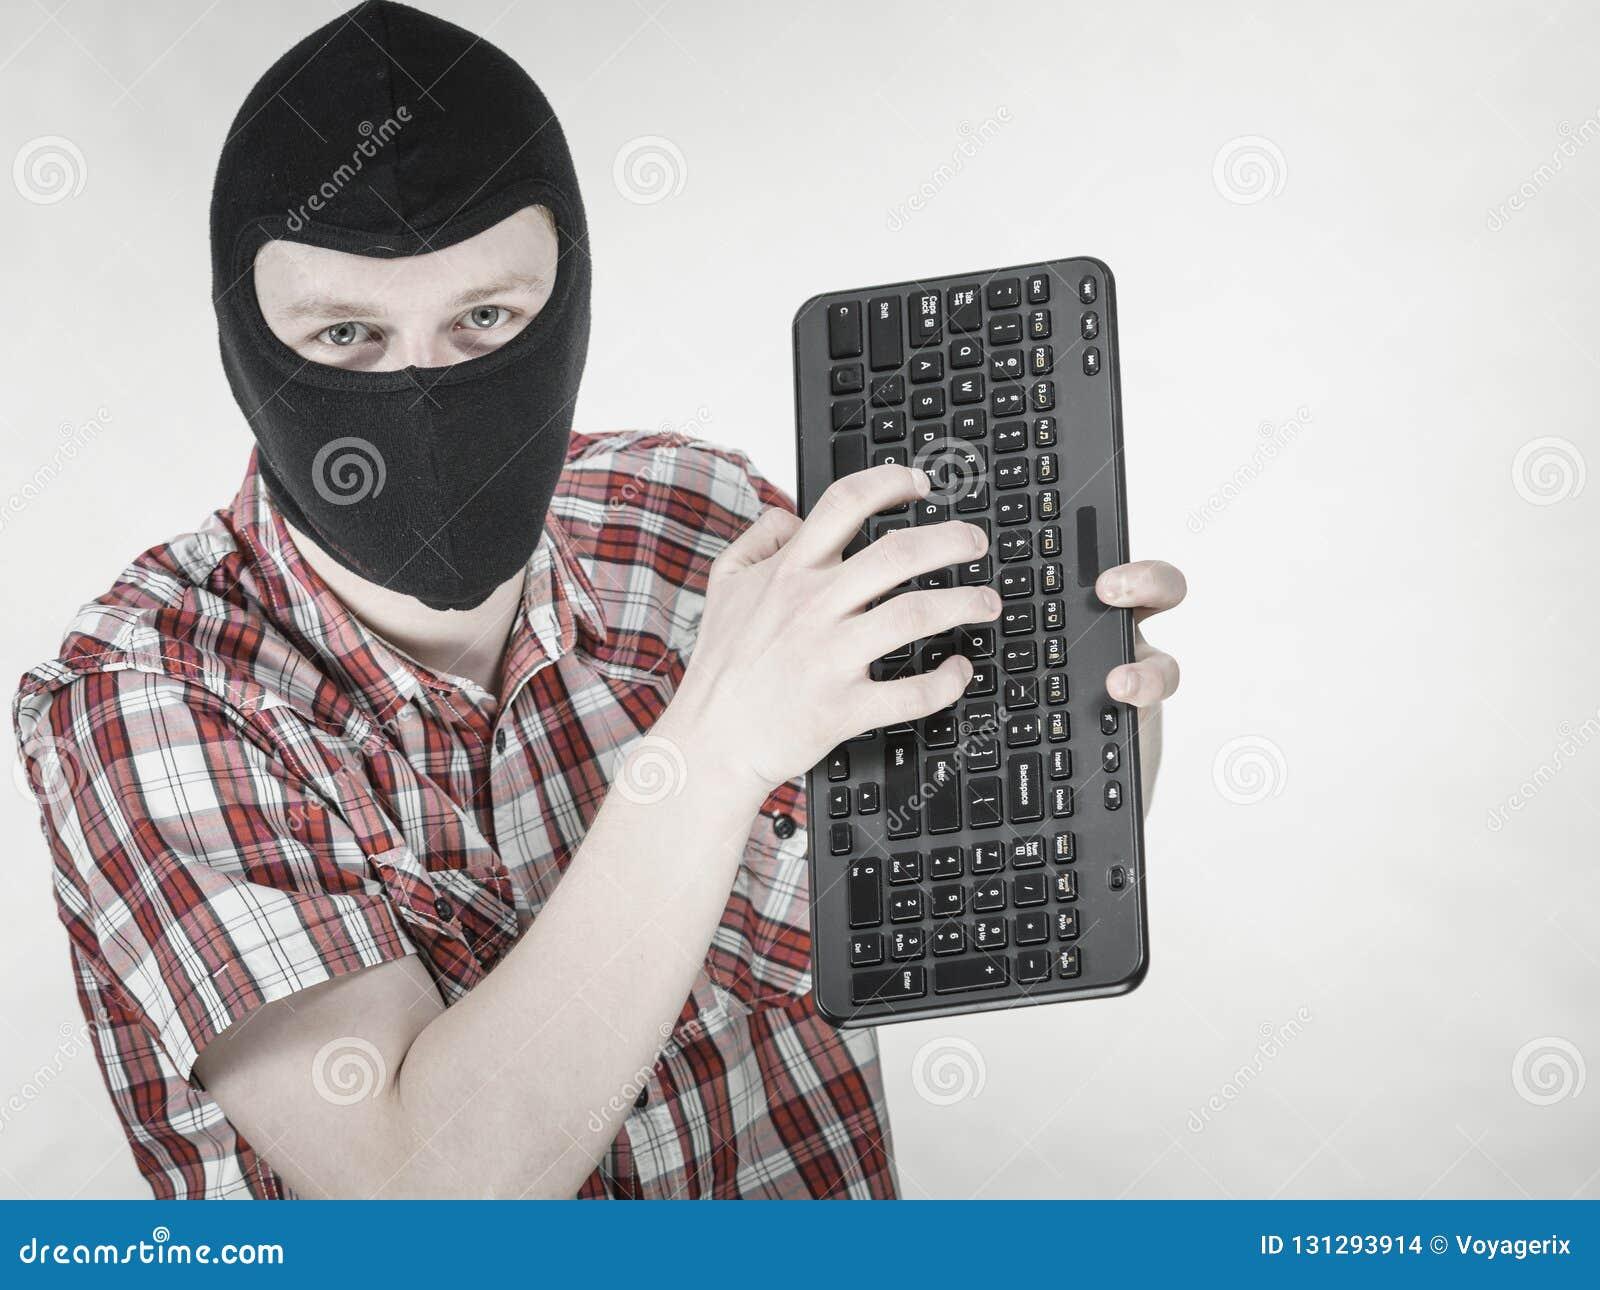 Man wearing balaclava holding keyboard